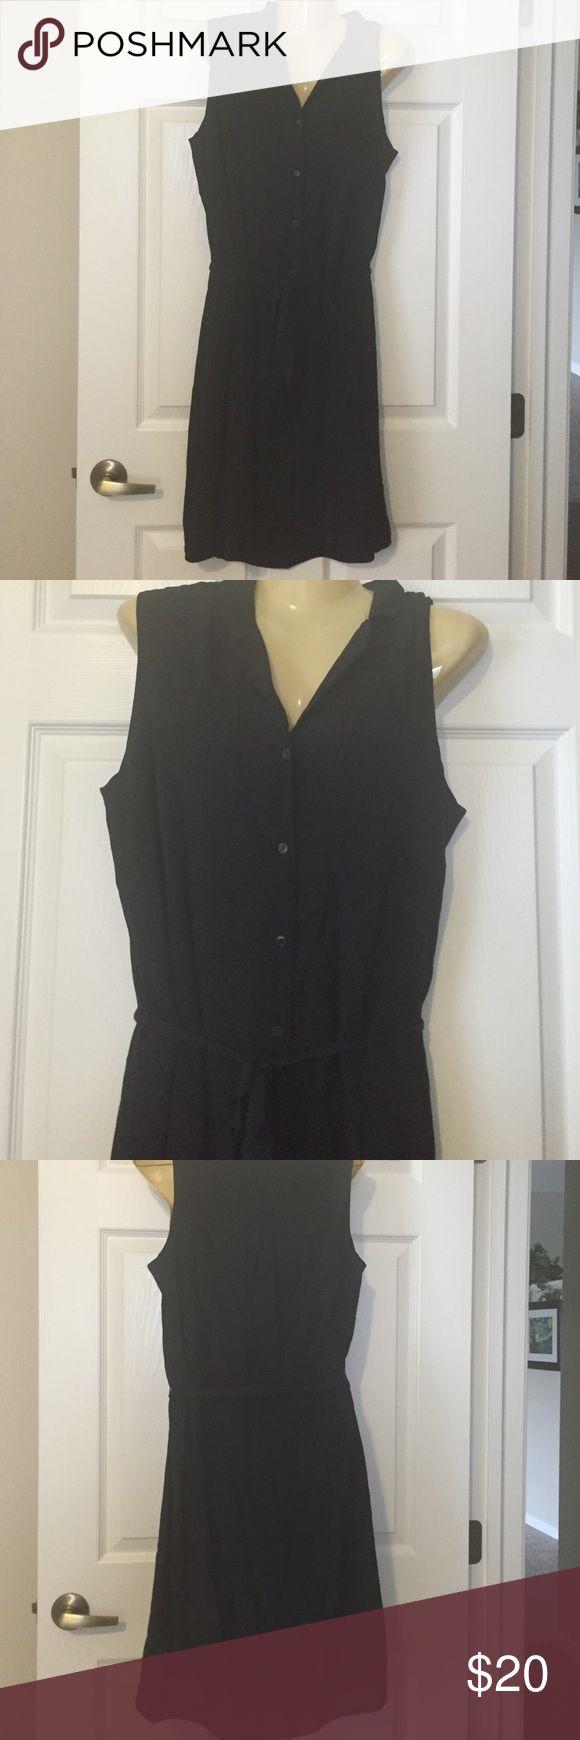 Loft black button down shirt dress Loft black button down shirt dress. Ties at the waist LOFT Dresses